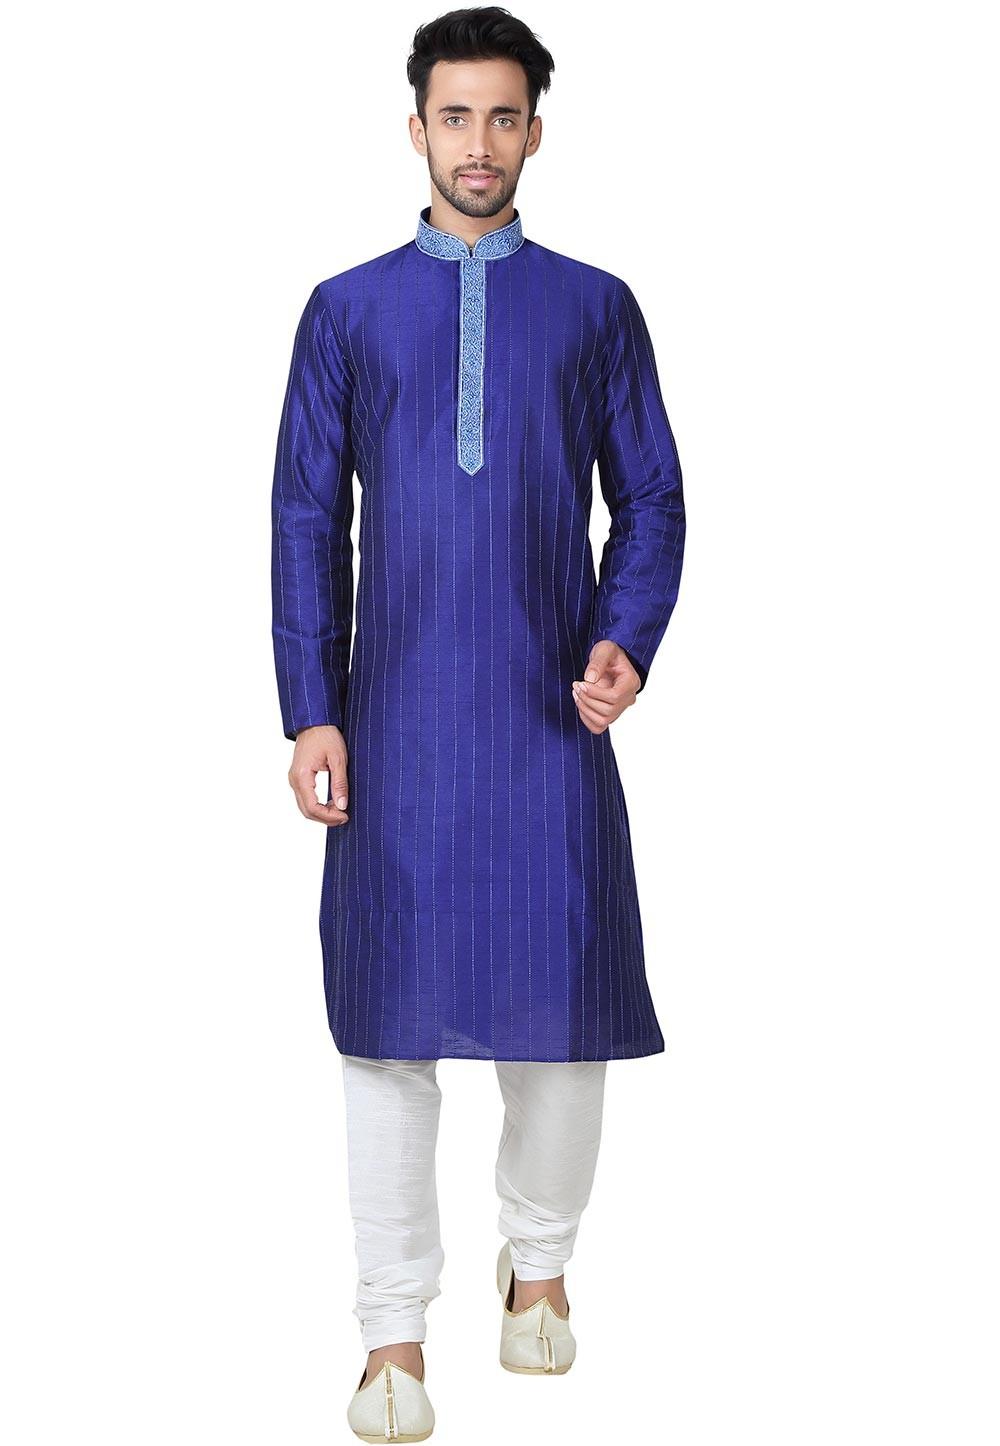 Blue Color Art Silk Readymade Kurta Pajama With Thread Work.